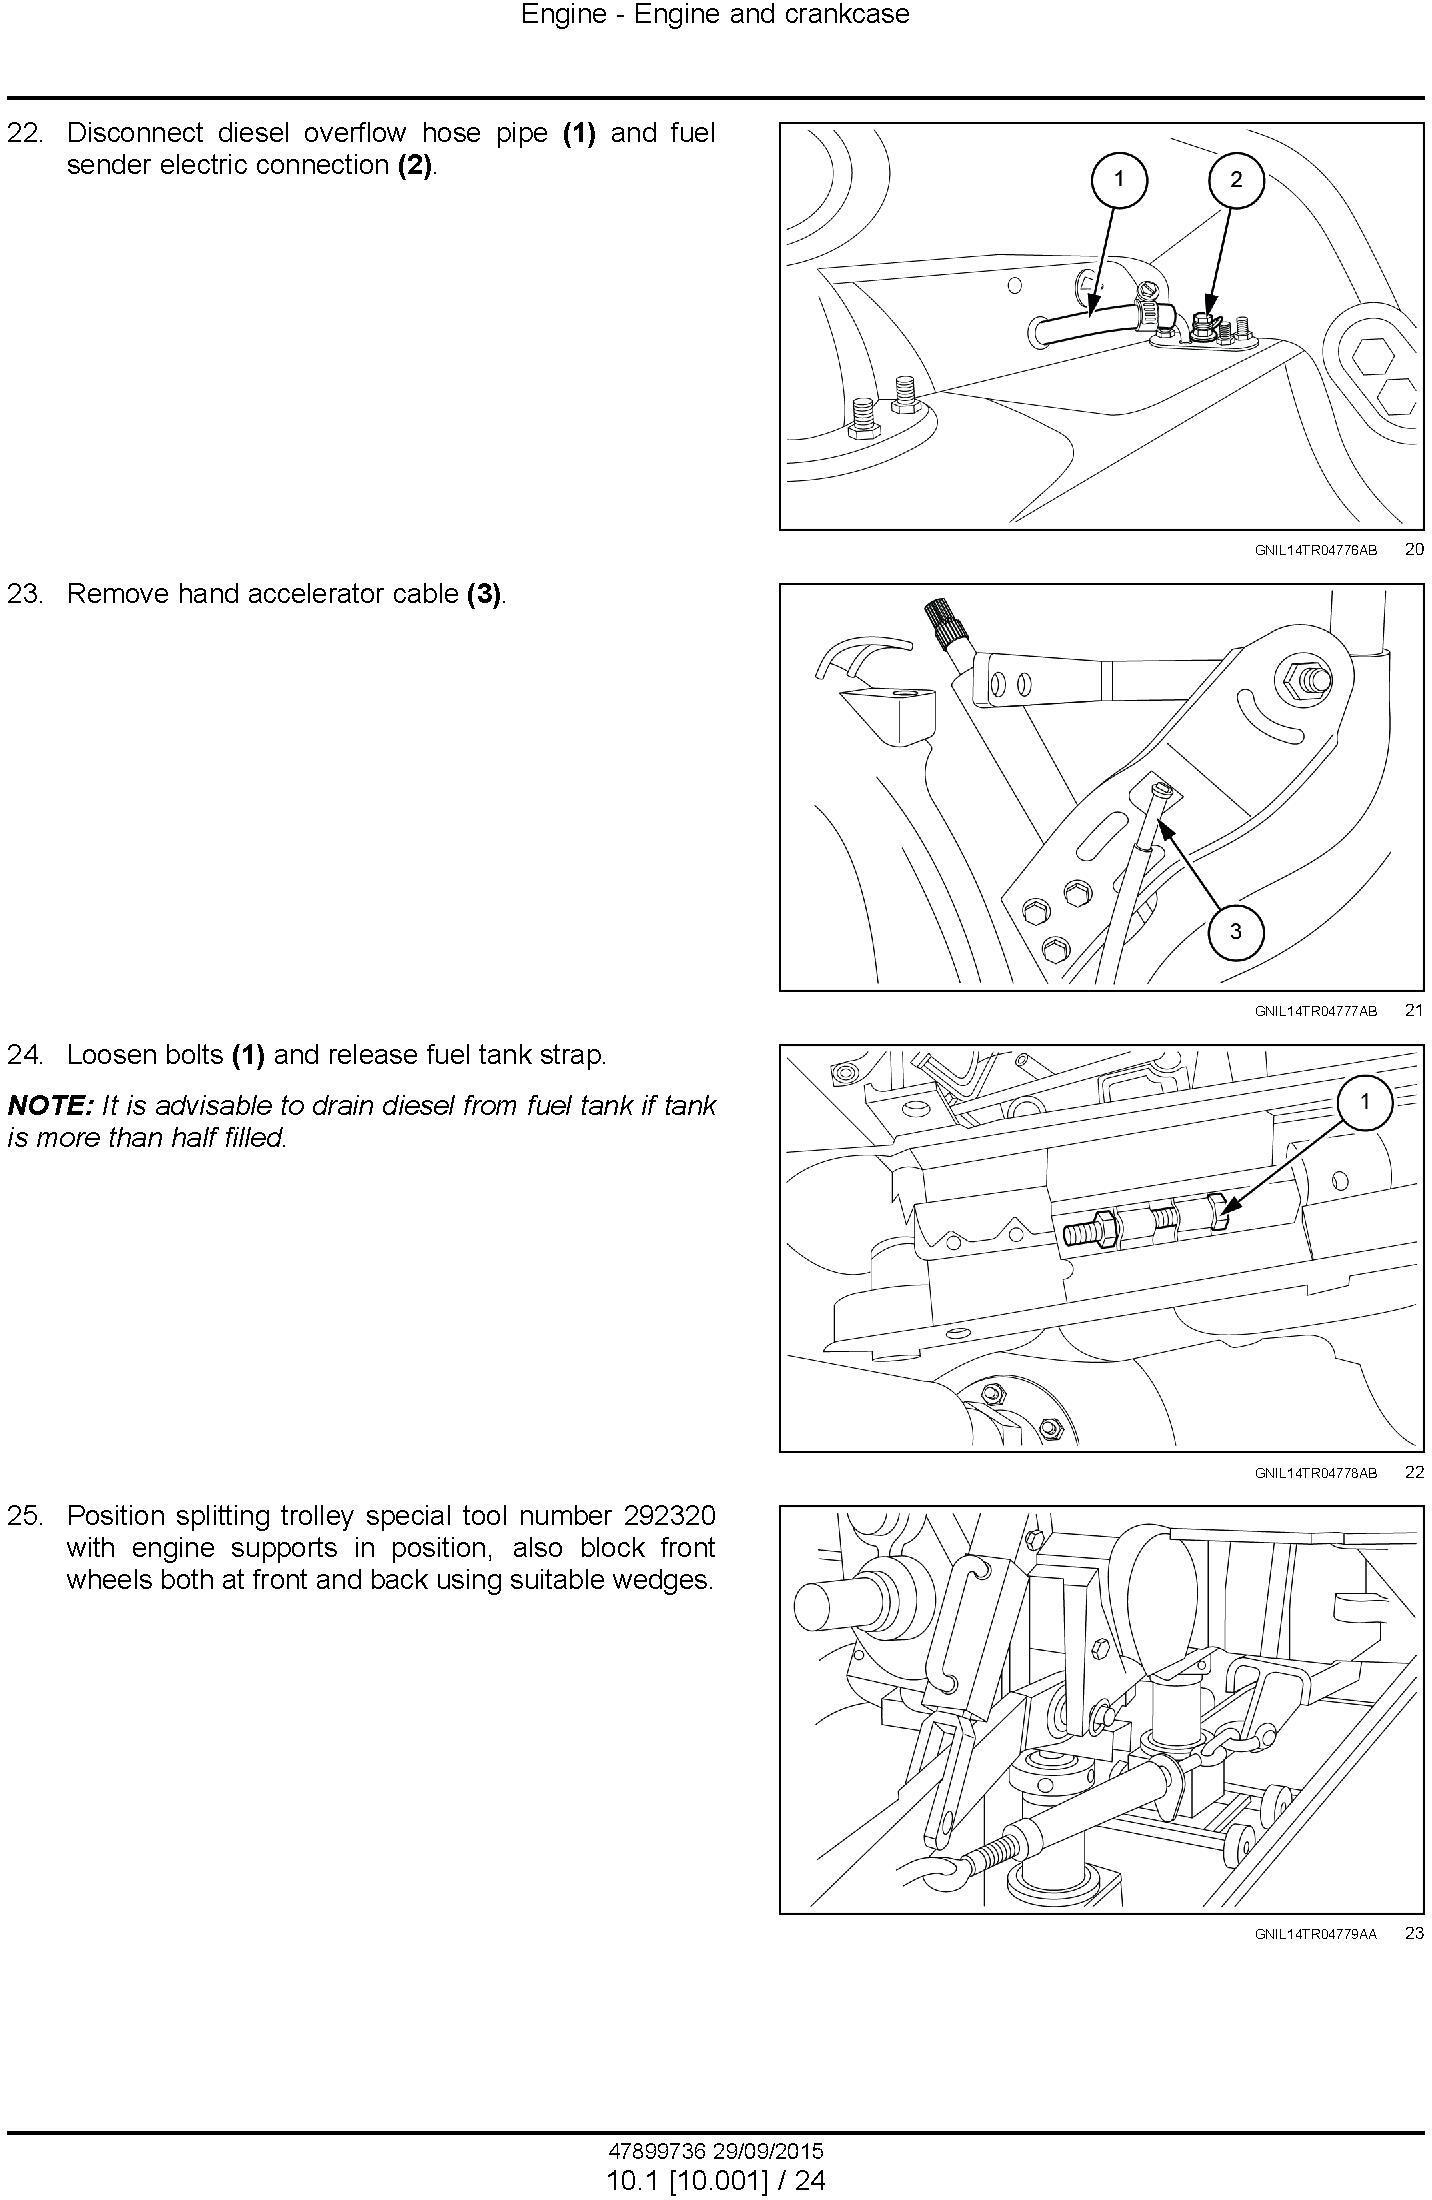 New Holland TT35, TT40, TT45 2WD or 4WD Tractor Service Manual - 1